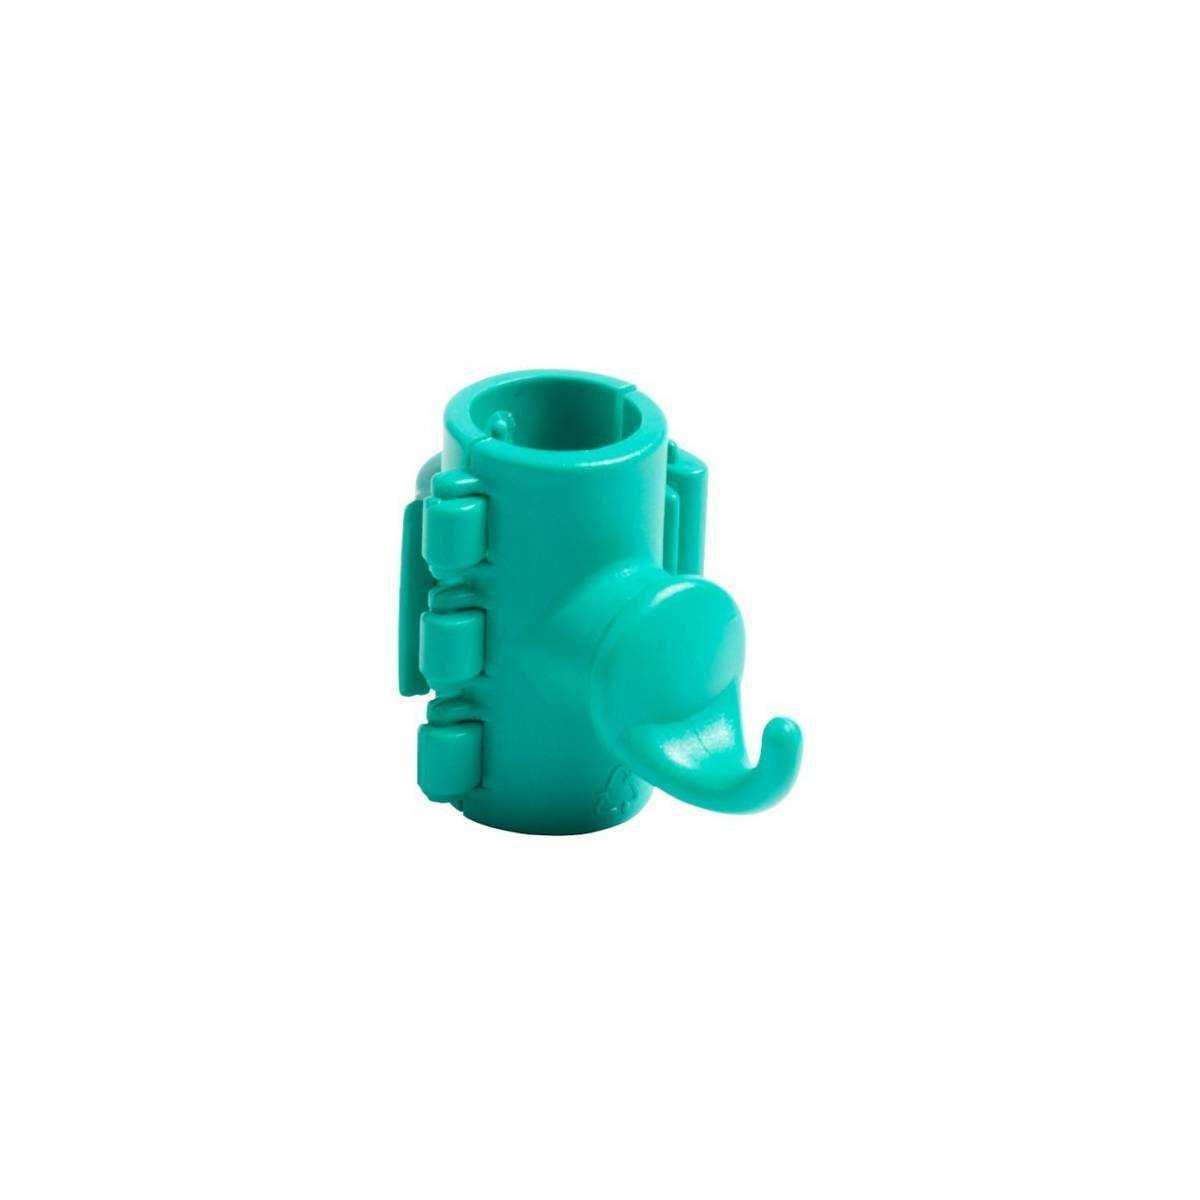 Крючок одинарный на стойку (3592) 00003592 TTS